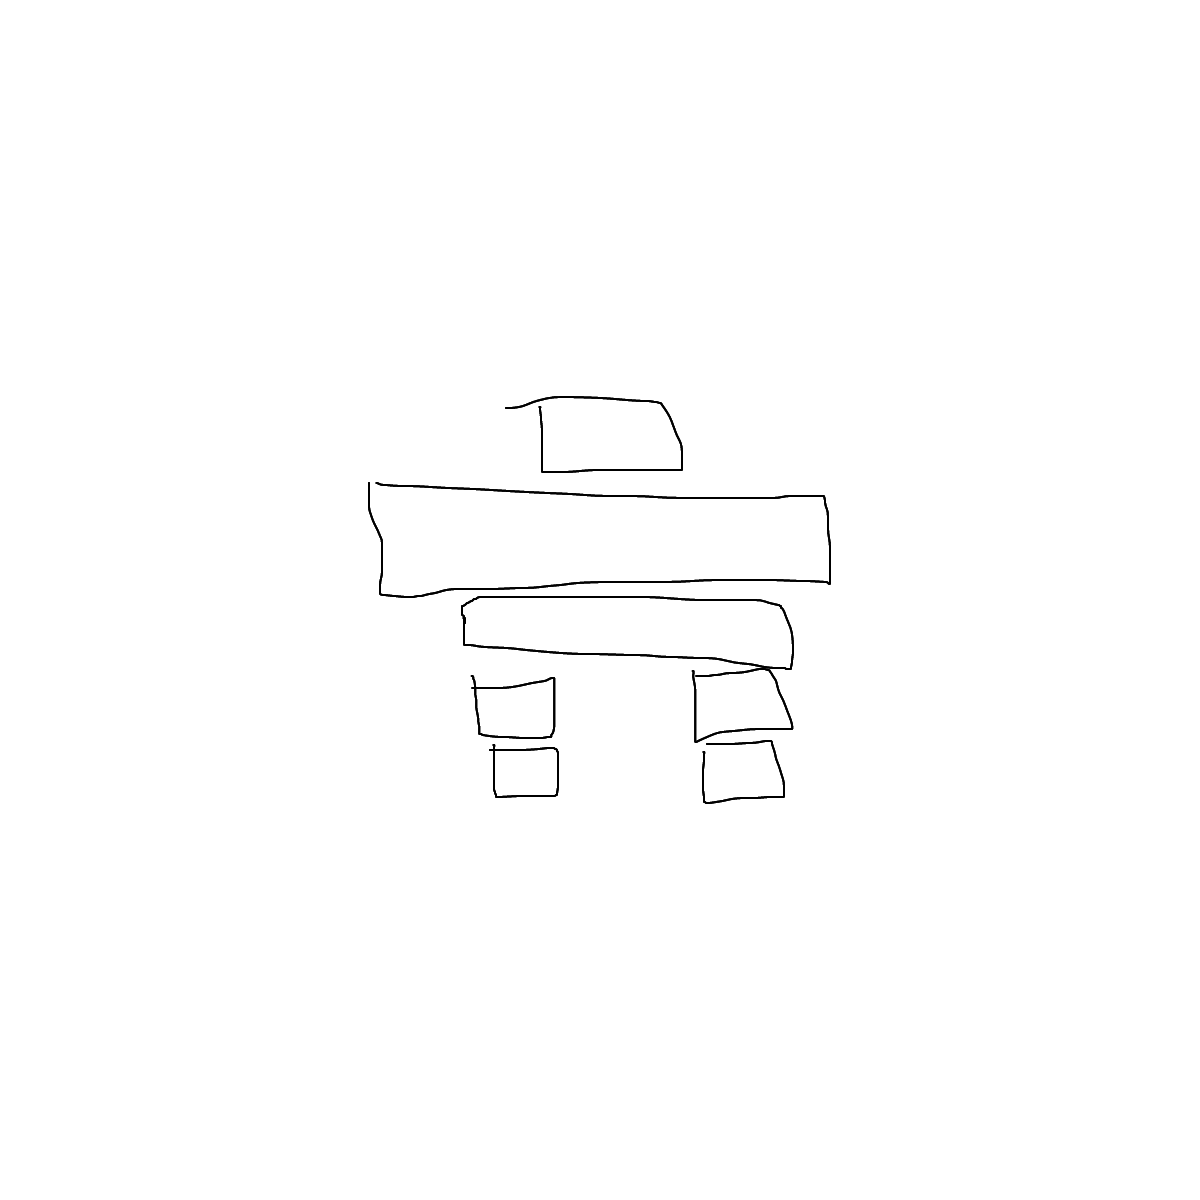 BAAAM drawing#17322 lat:73.5175628662109400lng: -77.2477569580078100